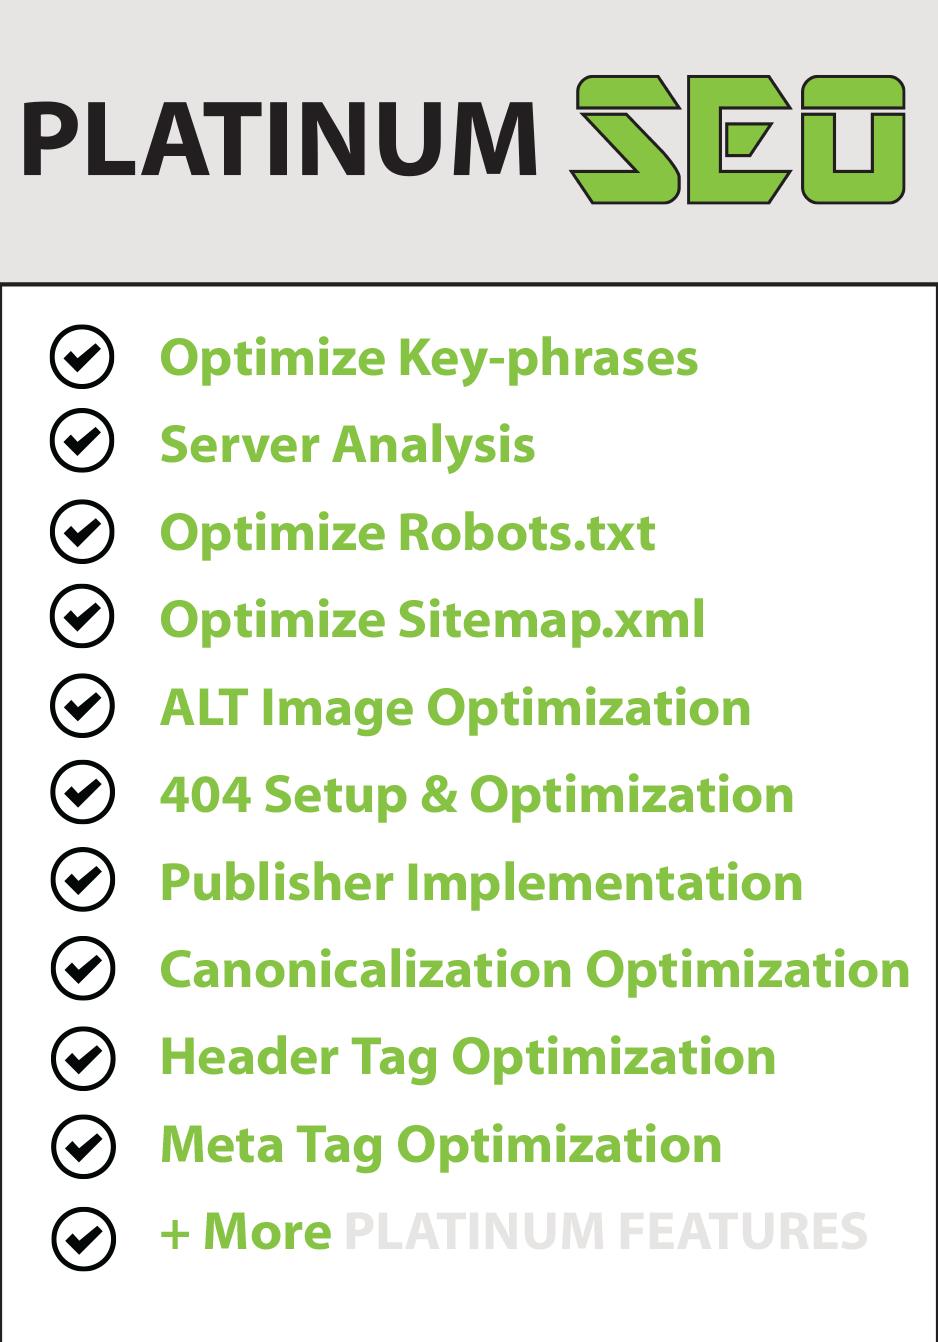 seo rankin search engine optimization marketing 12 month